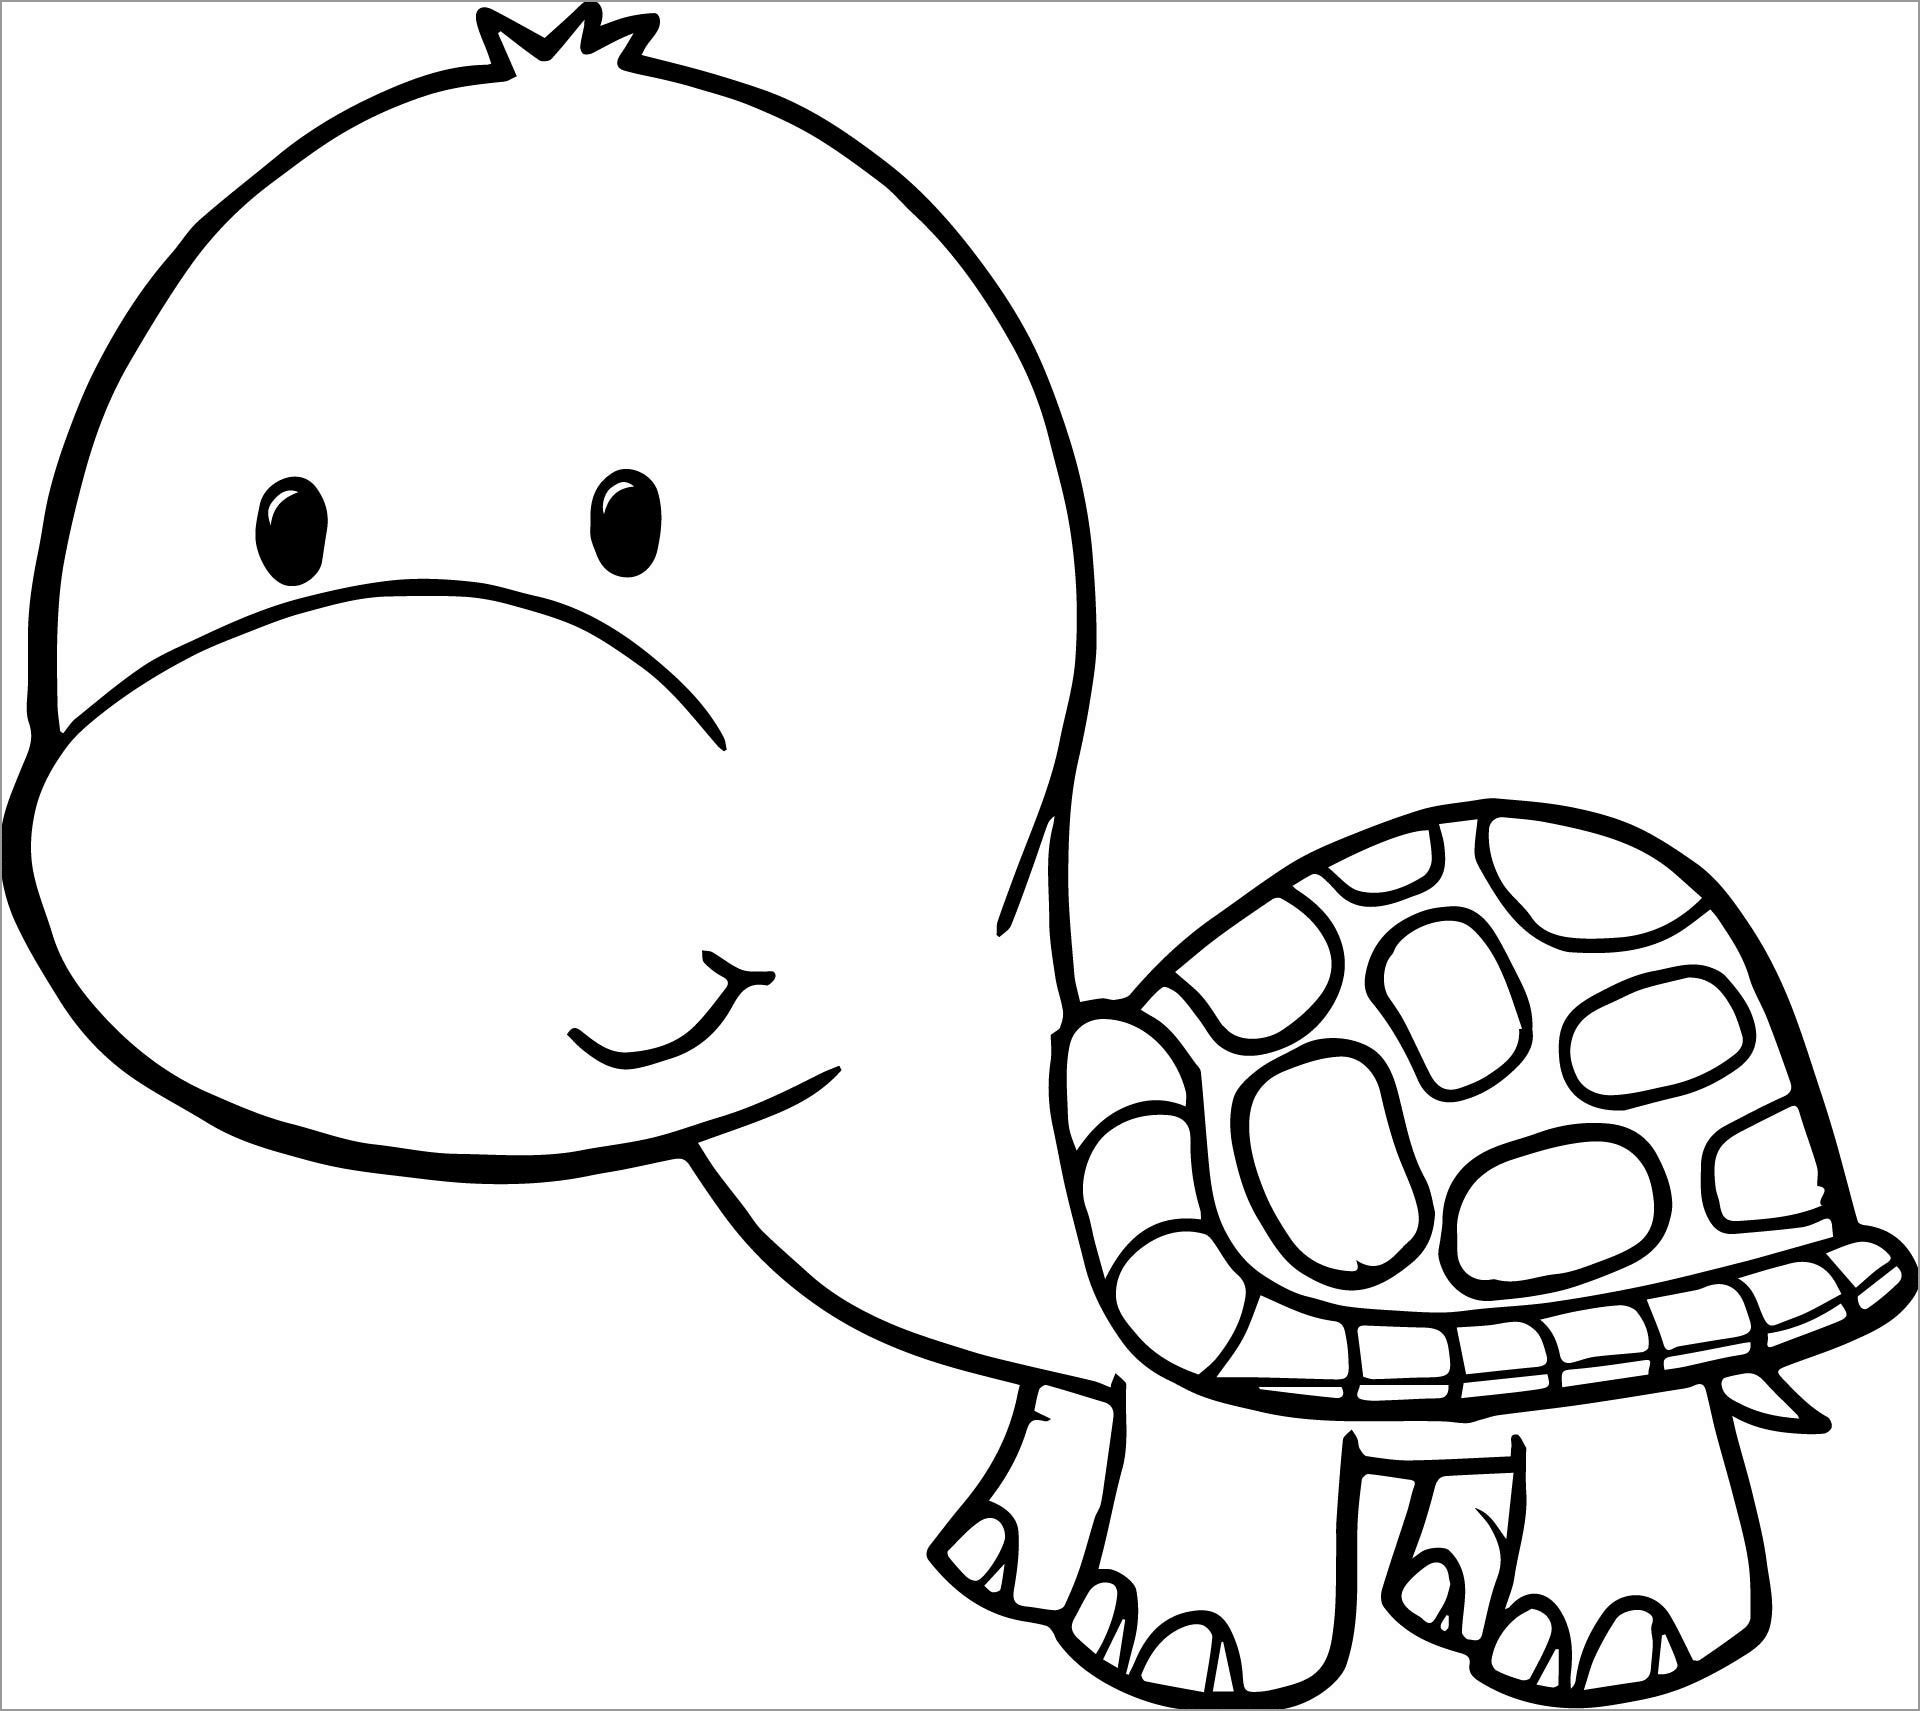 Cartoon Turtle Coloring Page